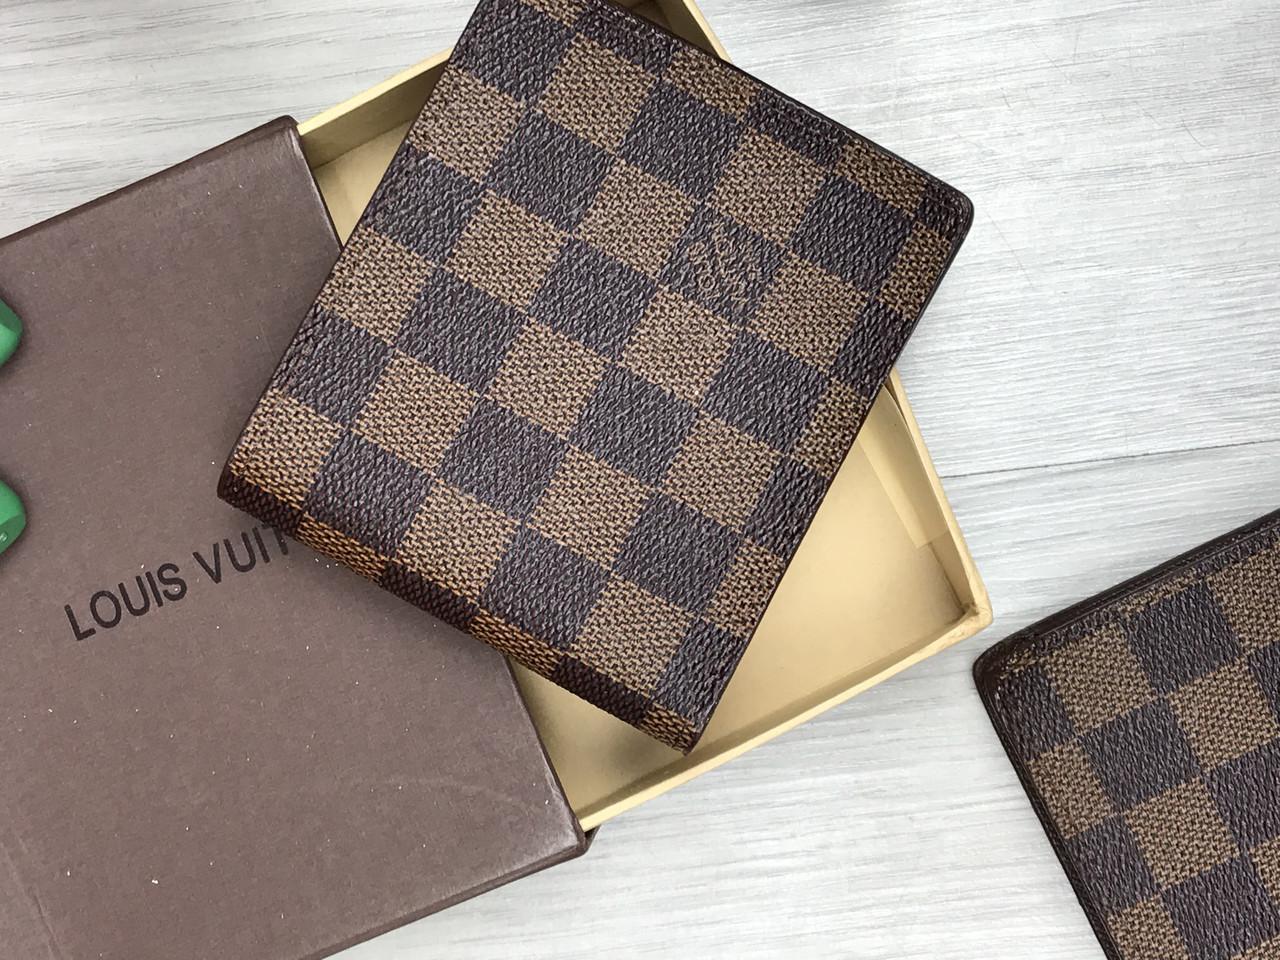 0597f5896b96 Кошелек коричневый в клетку Louis Vuitton Луи Виттон - Интернет-магазин